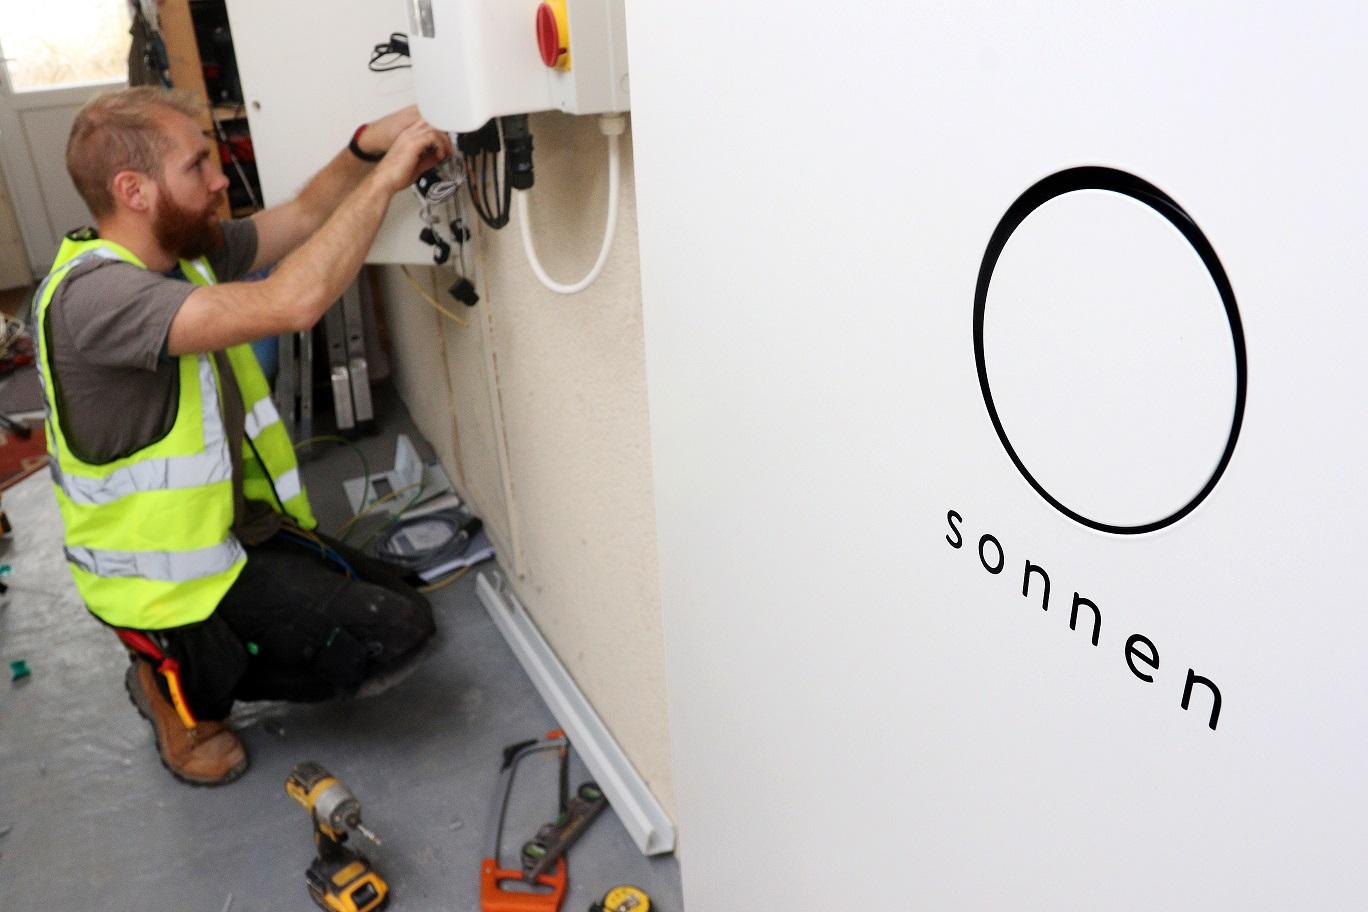 Shell και Sonnen ανταγωνίζονται την Tesla στον τομέα των οικιακών μπαταριών